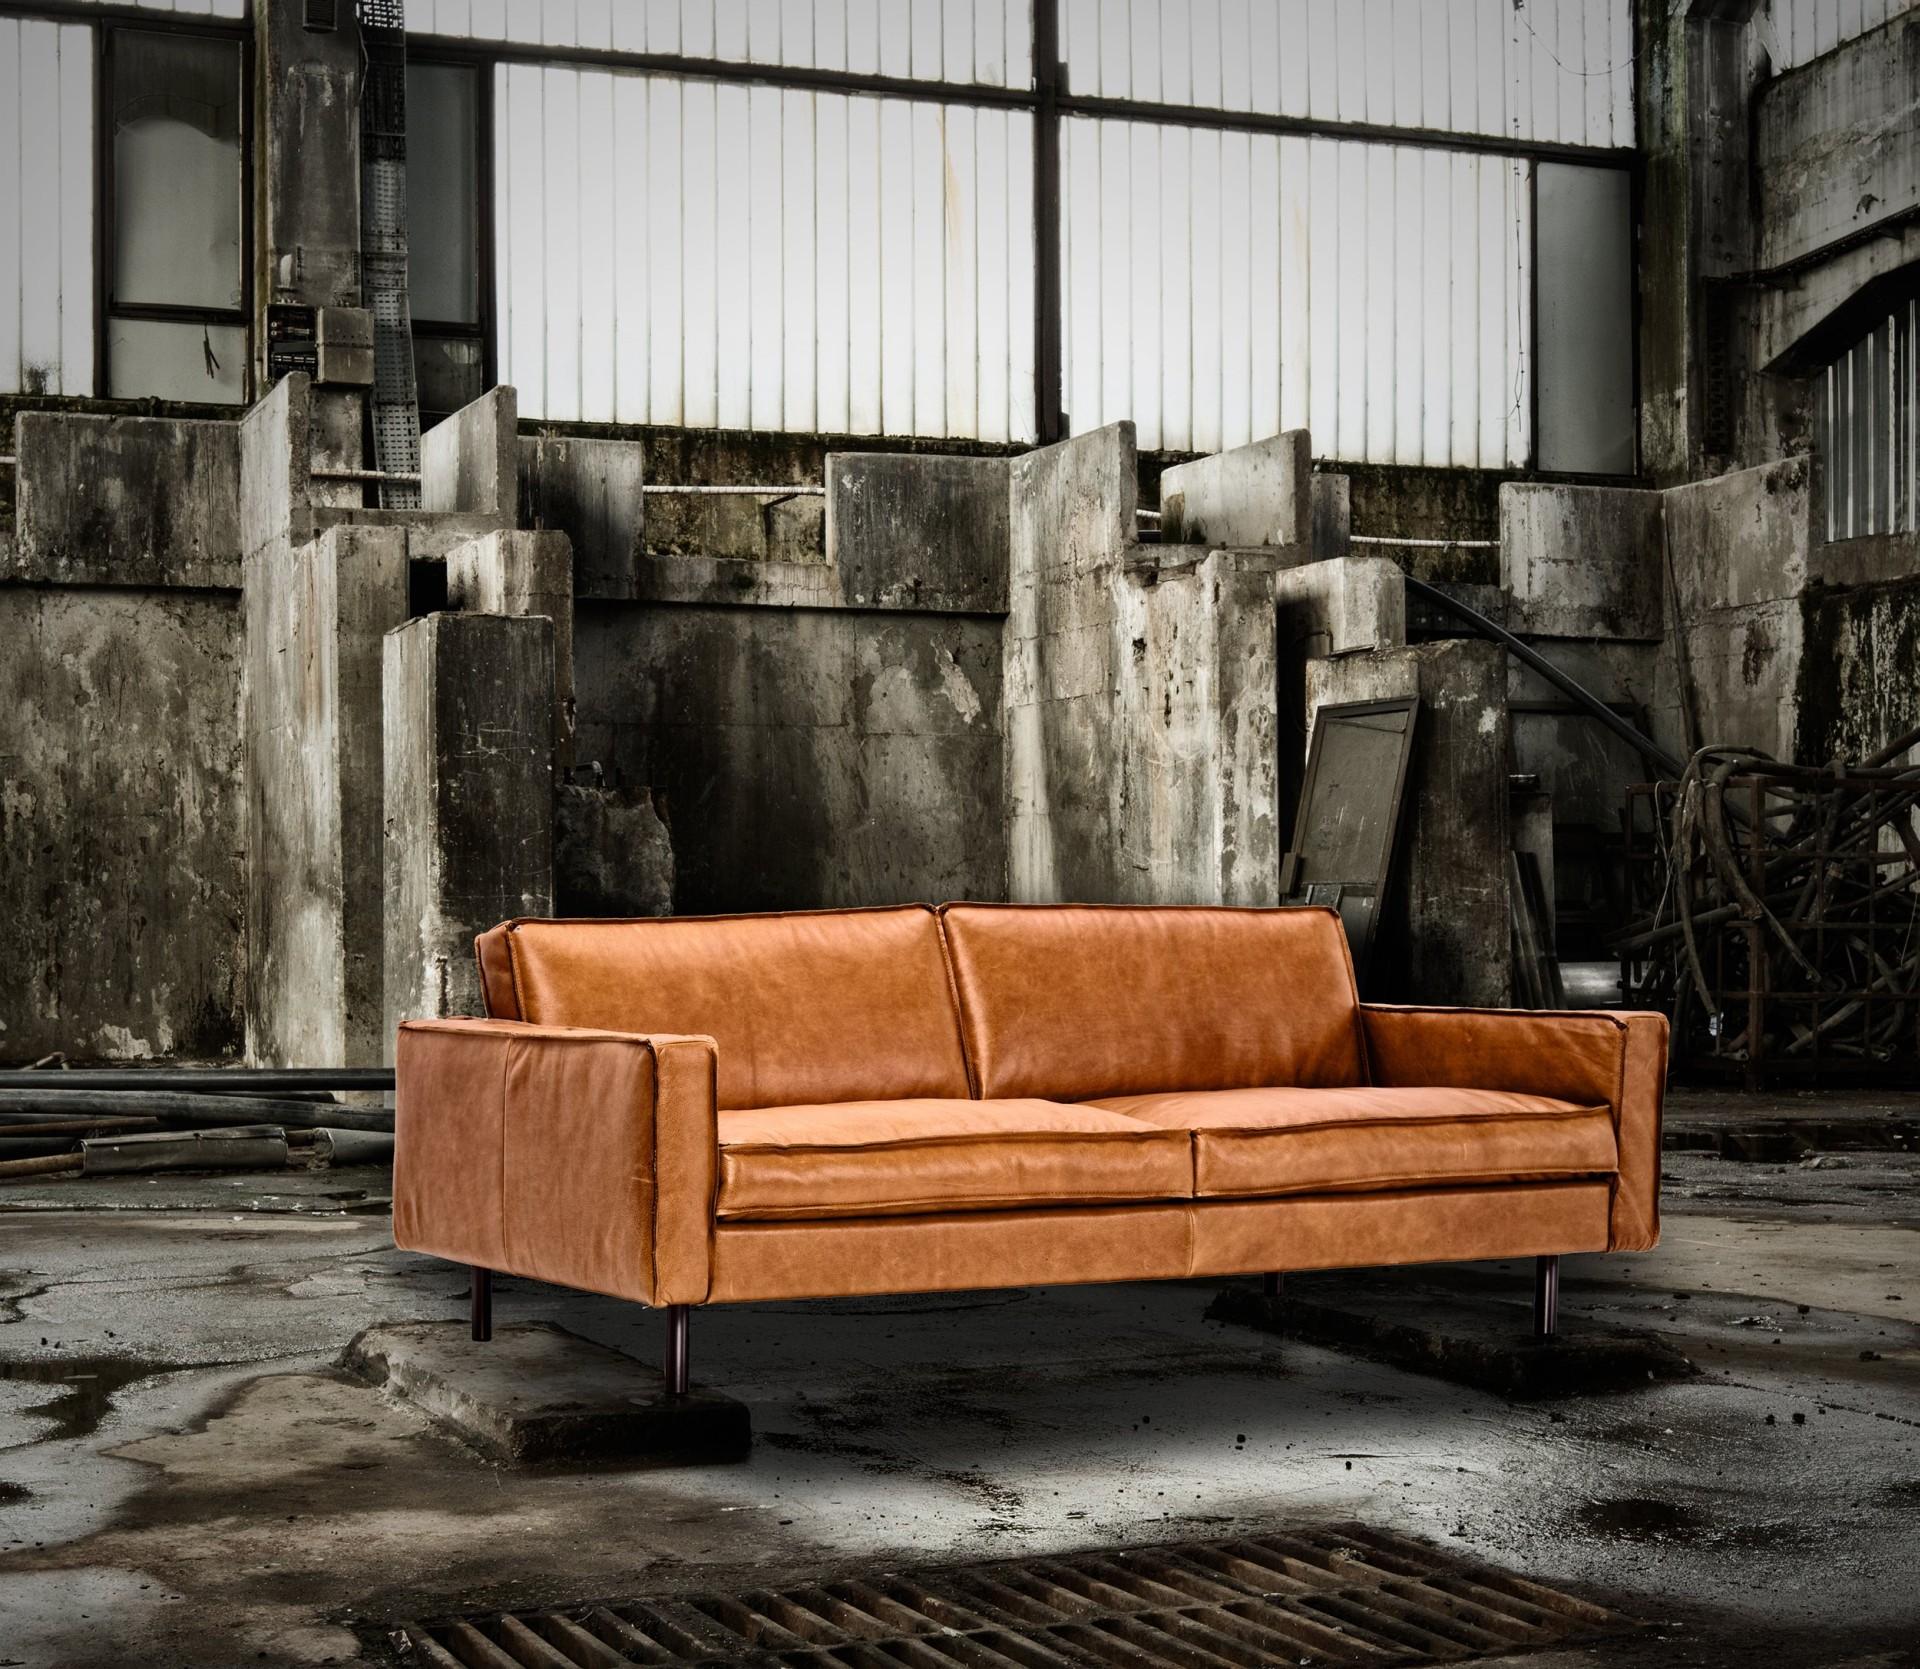 ledersofa gaucho vintage anilin cognac 3 sitzer 190 210 cm m bel wohnen sessel sofas. Black Bedroom Furniture Sets. Home Design Ideas